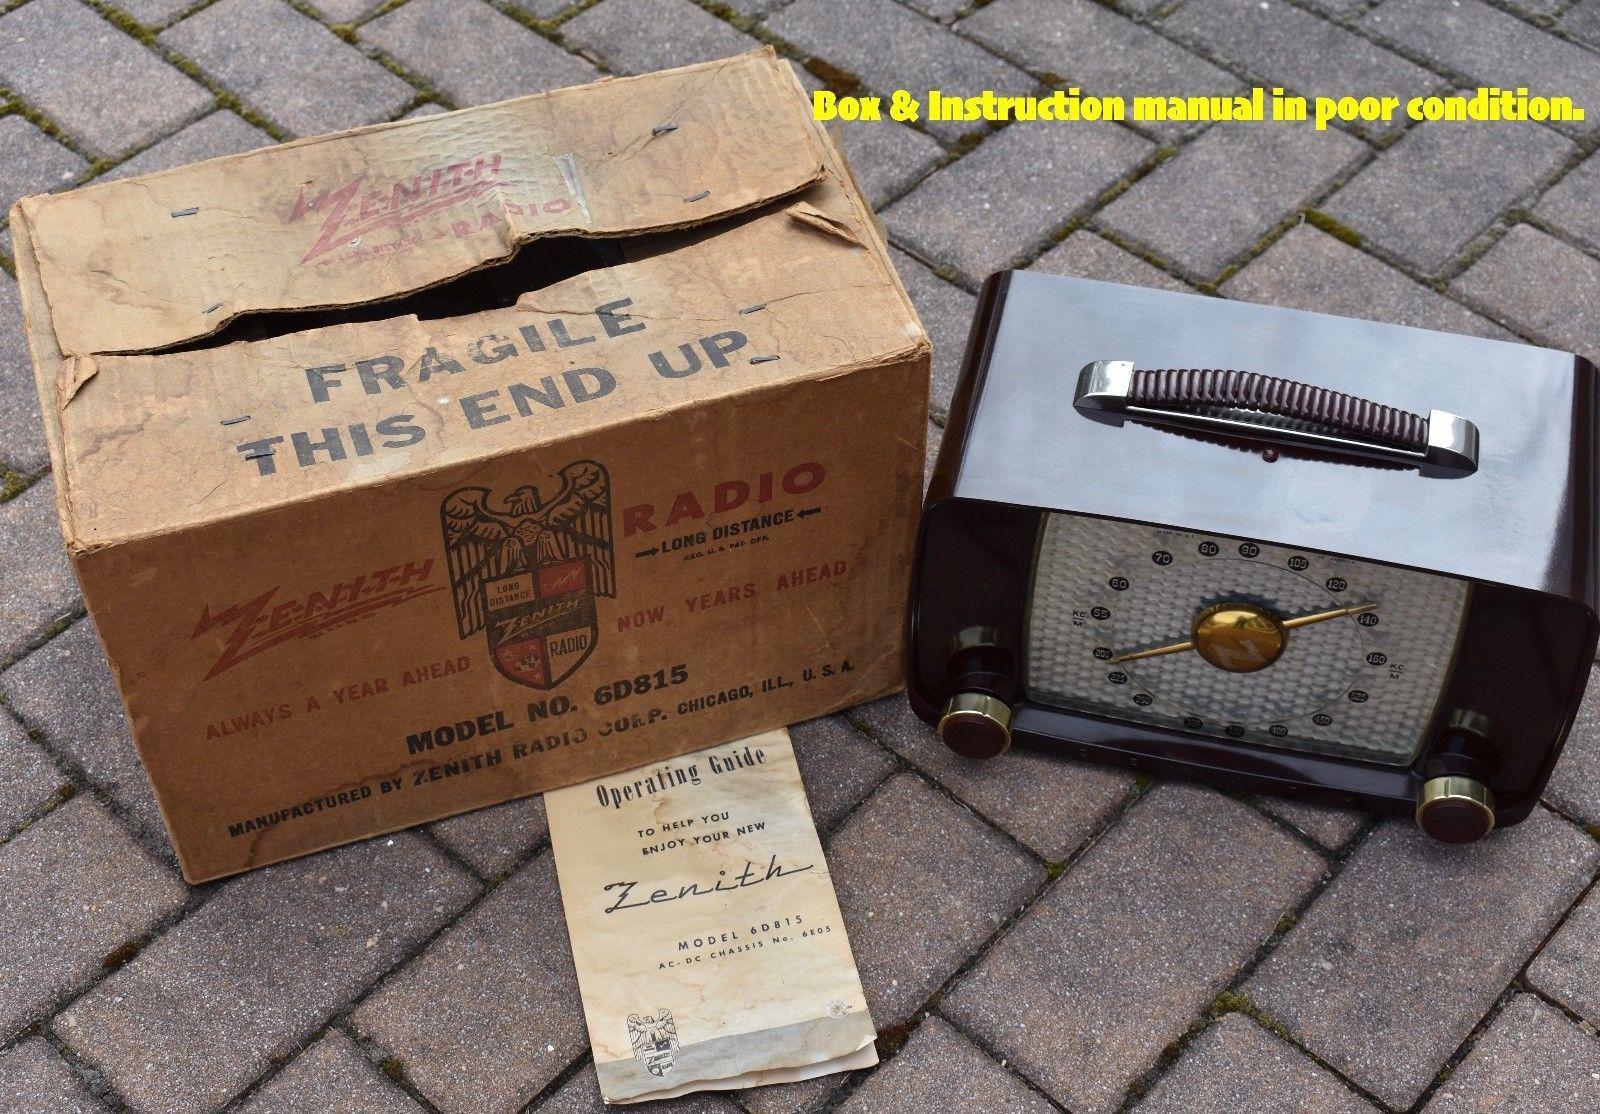 Zenith 6d815 Mid Century 6 Tube Radio Orig Box Manual Plays Well. Zenith 6d815 Mid Century 6 Tube Radio Orig Box Manual Plays Well Ebay. Wiring. Zenith Tube Radio Schematics Model 6s At Scoala.co